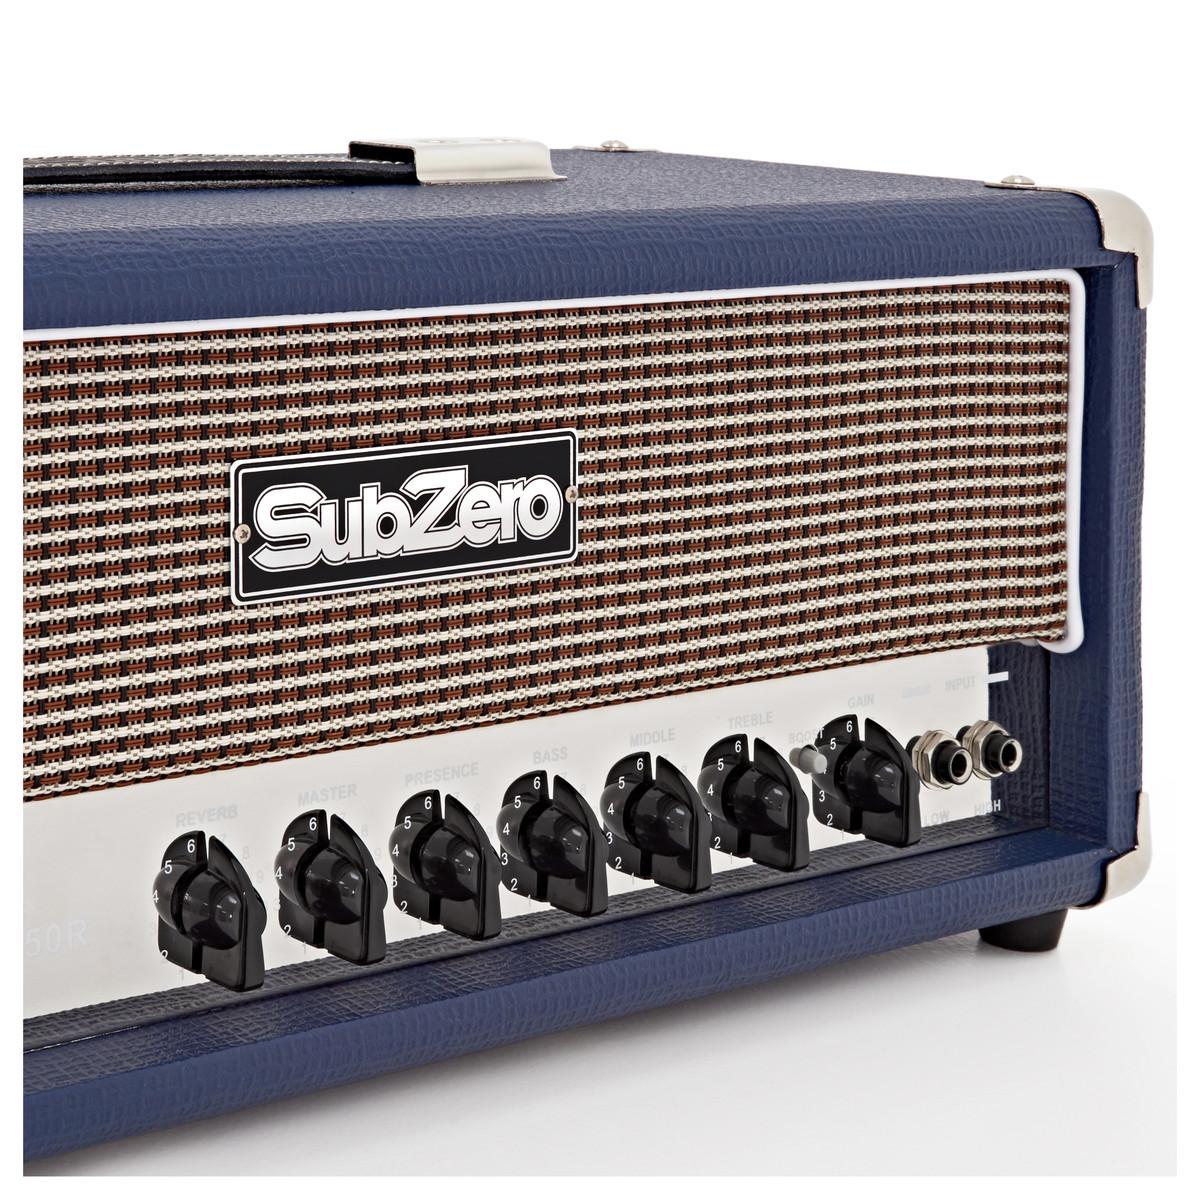 subzero valve 50 guitar amp head at gear4music. Black Bedroom Furniture Sets. Home Design Ideas